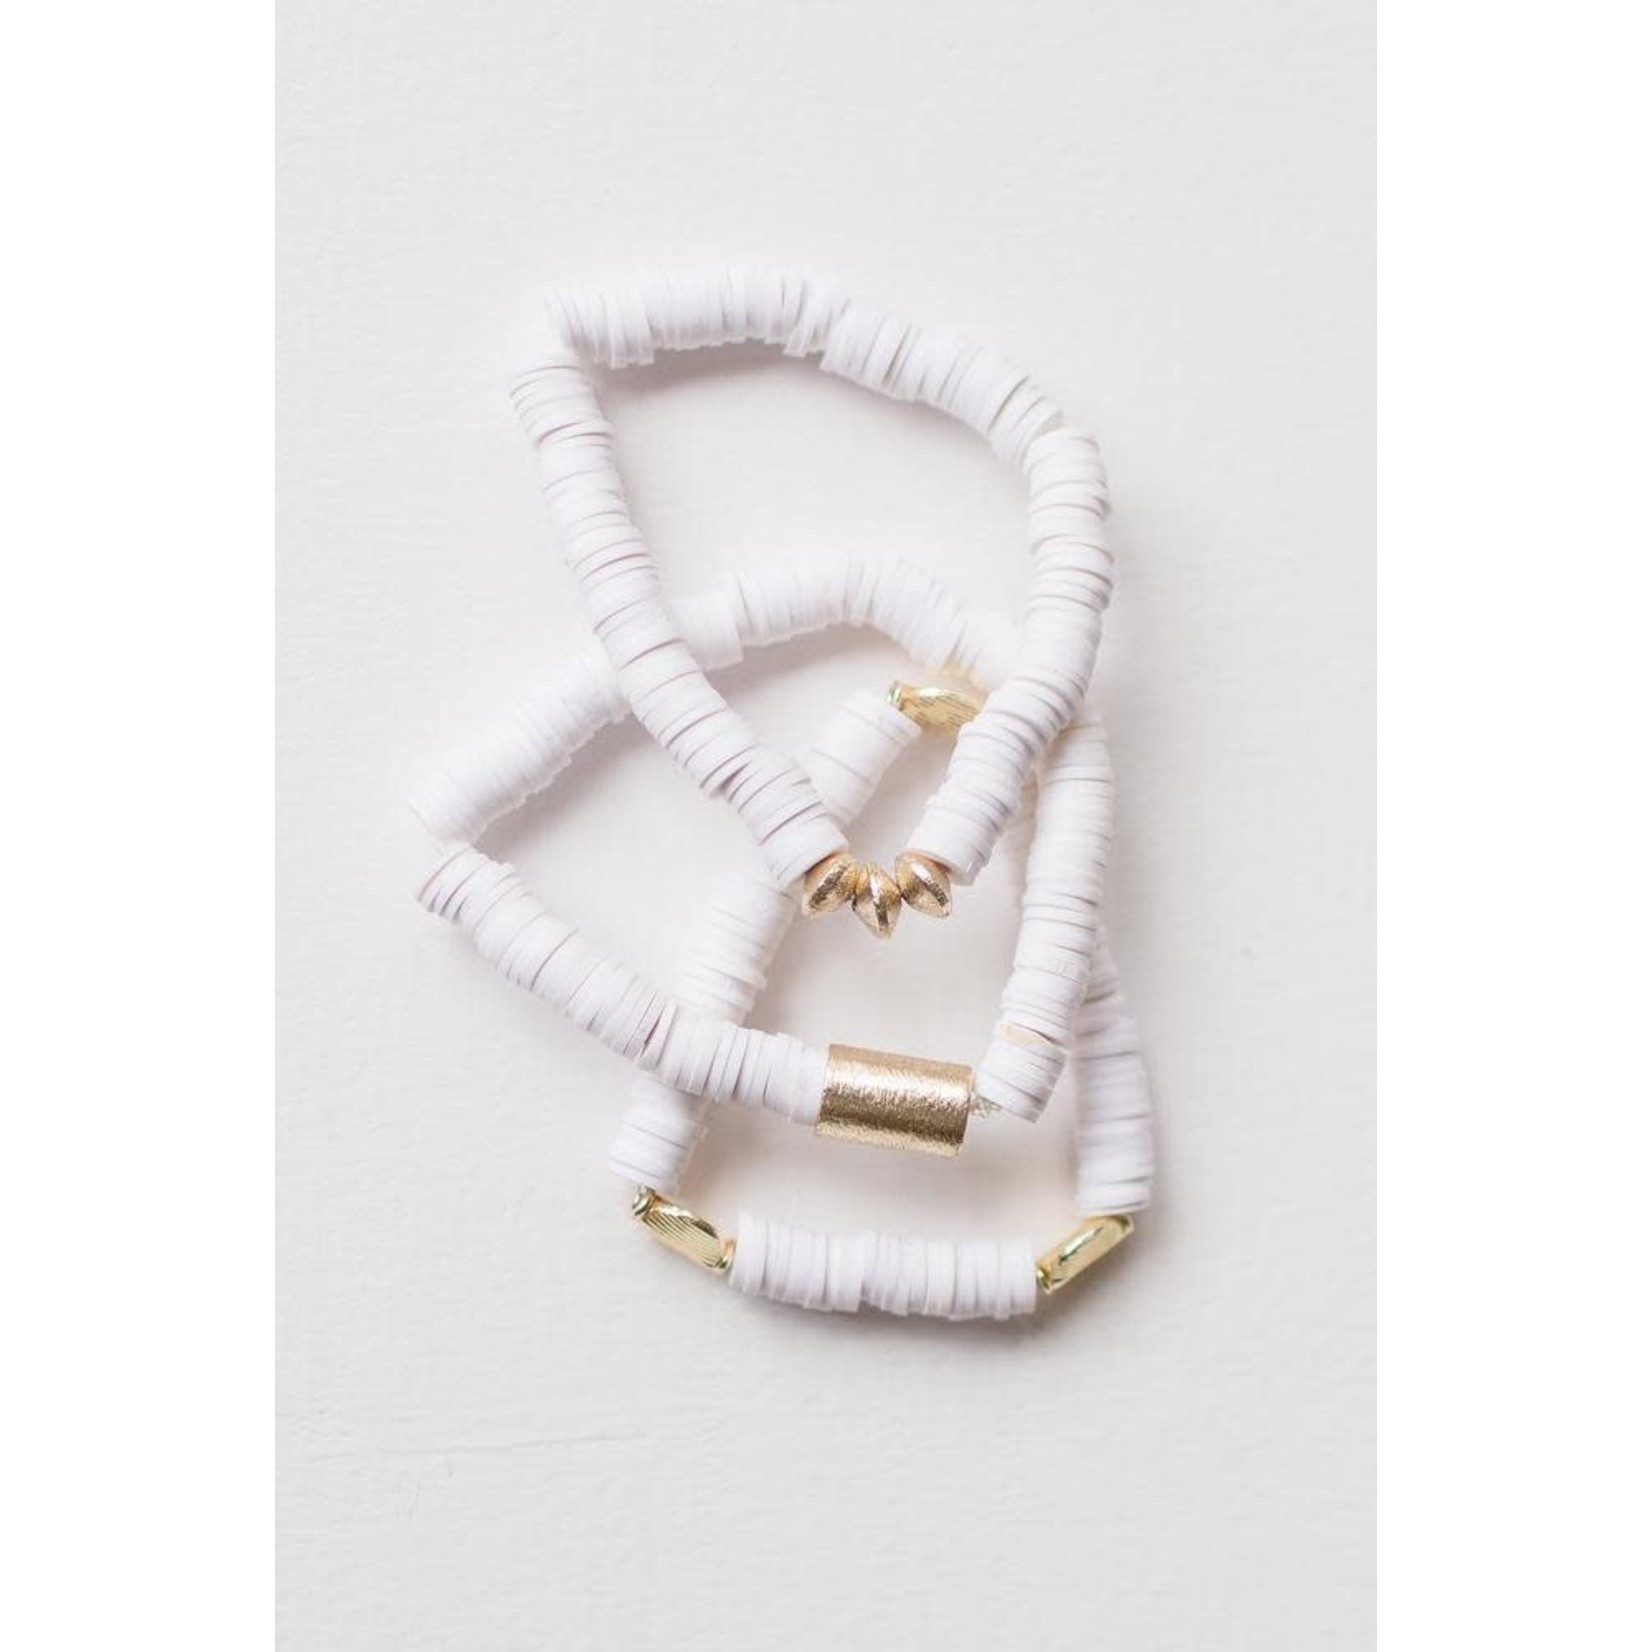 Leslie Curtis Jewelry Designs Ava Set of 3 Bracelets